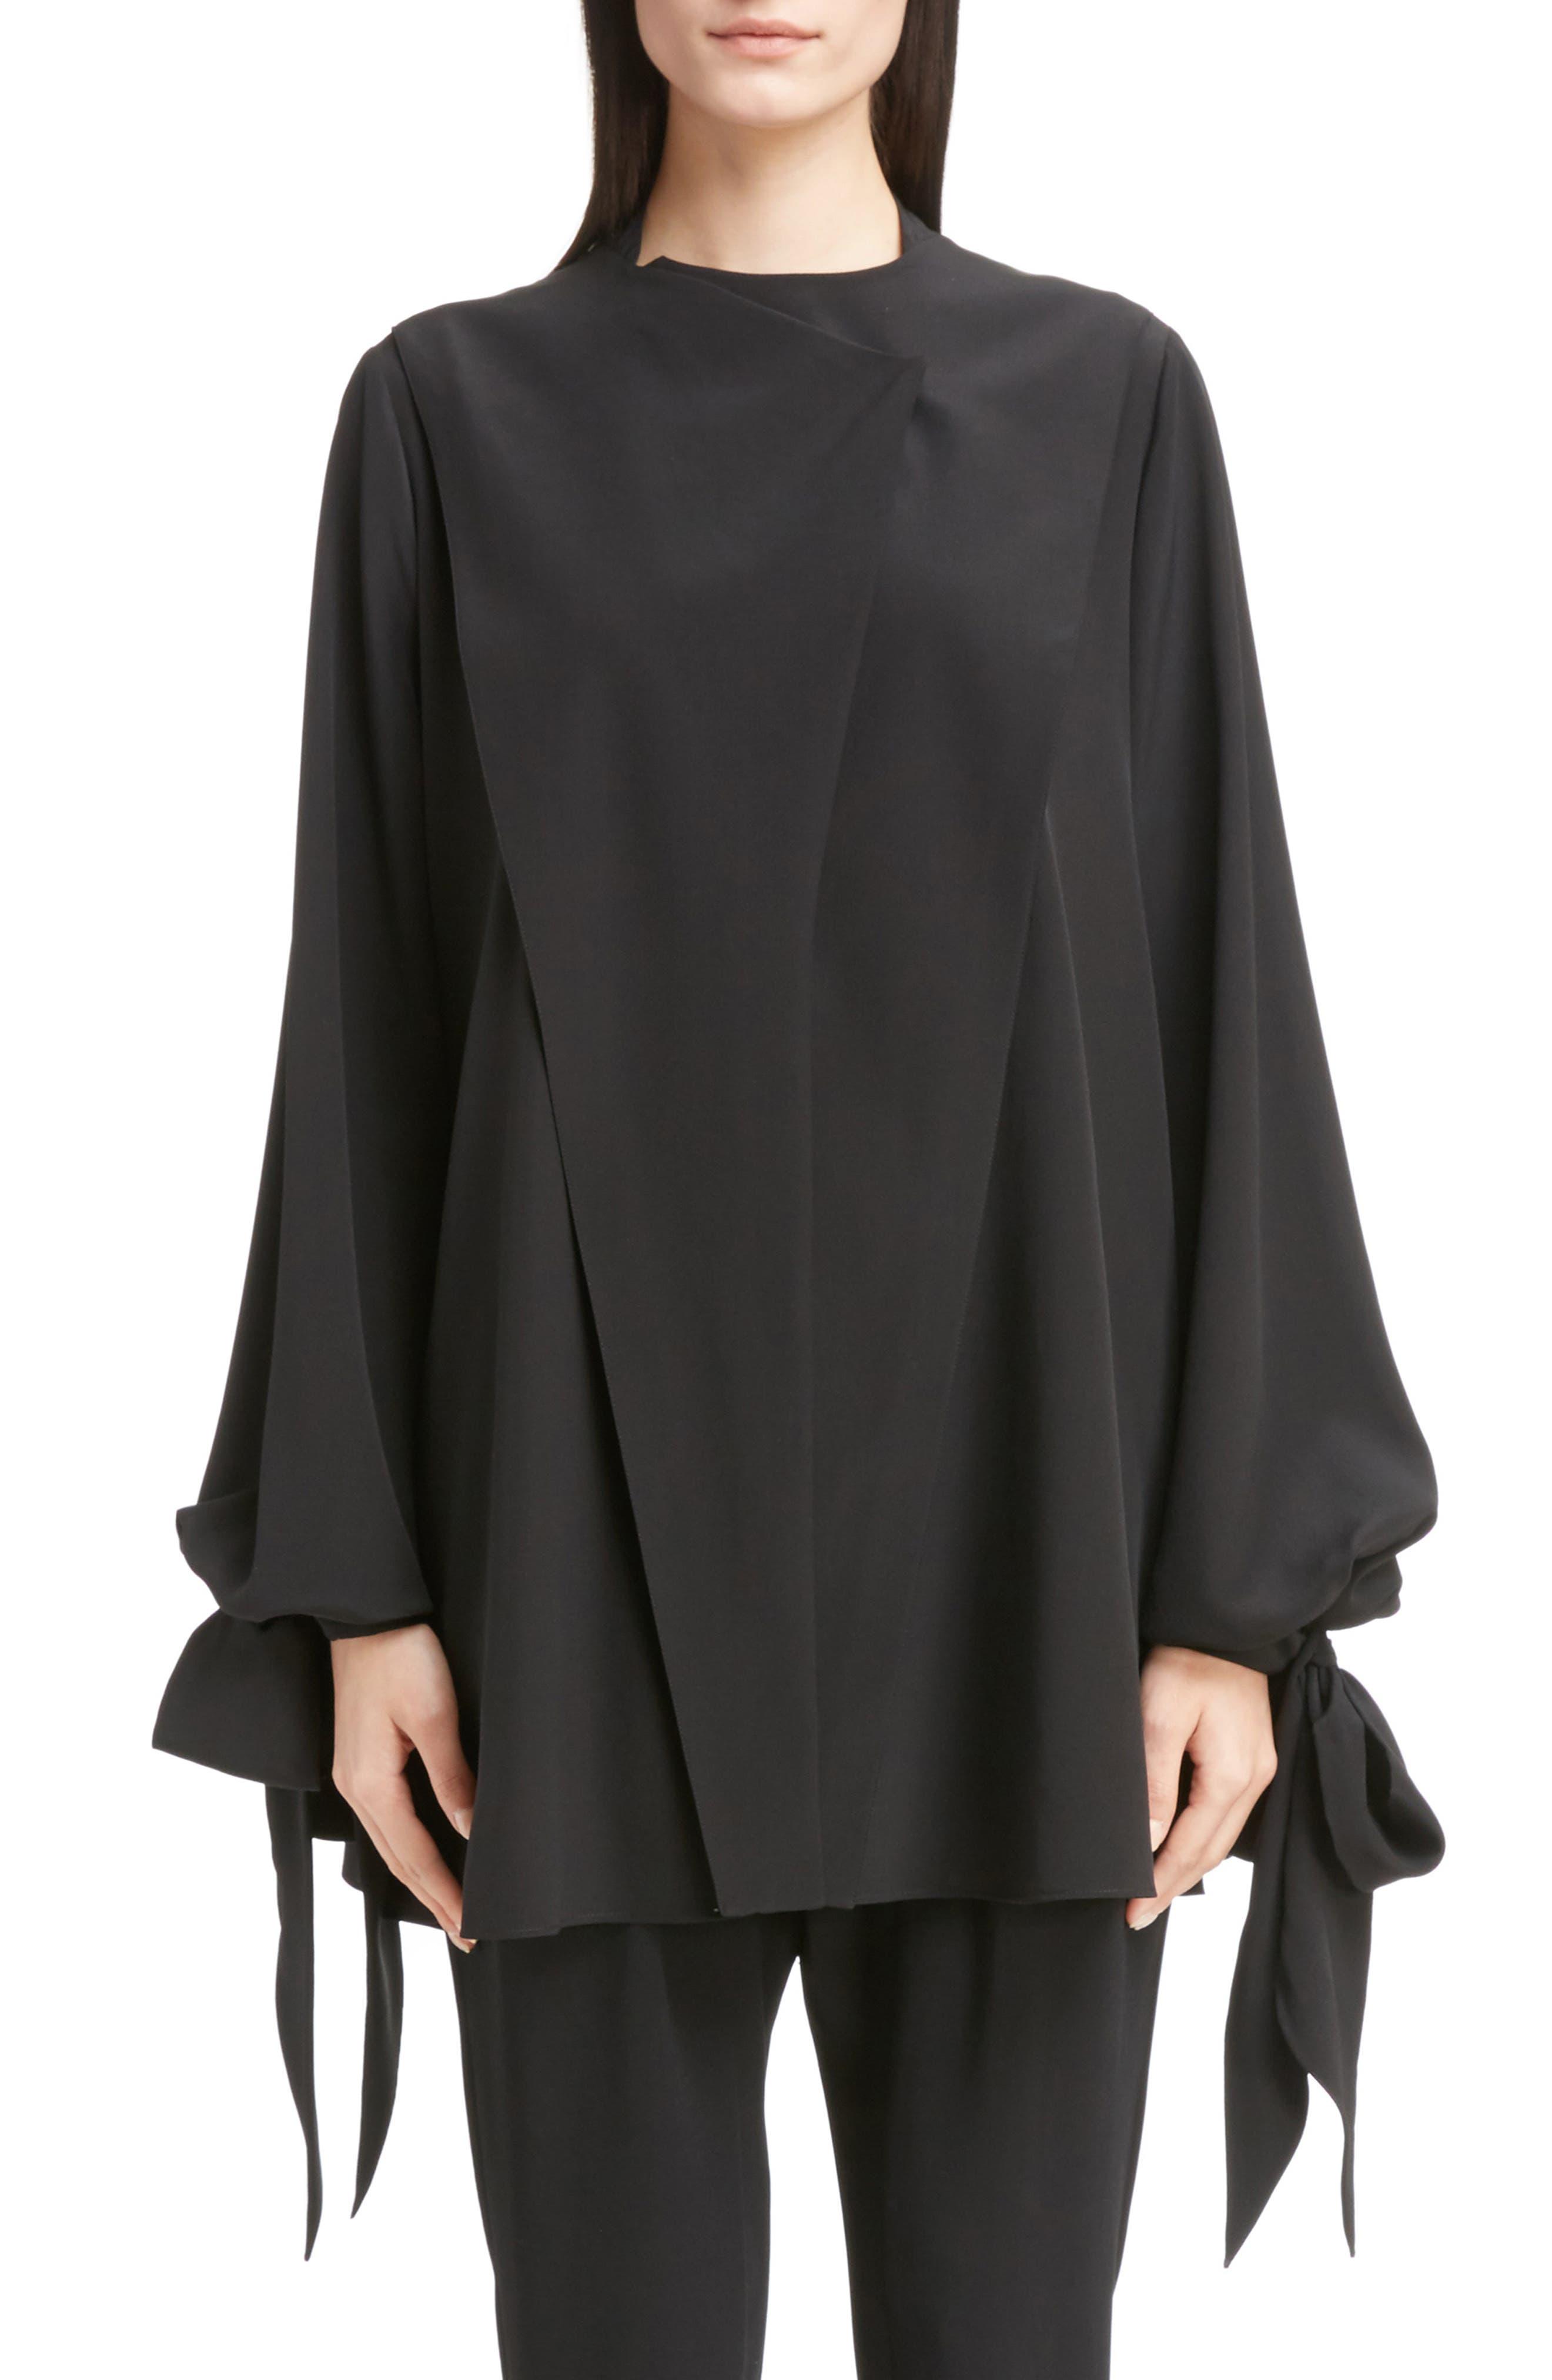 Givenchy Silk Drape Top